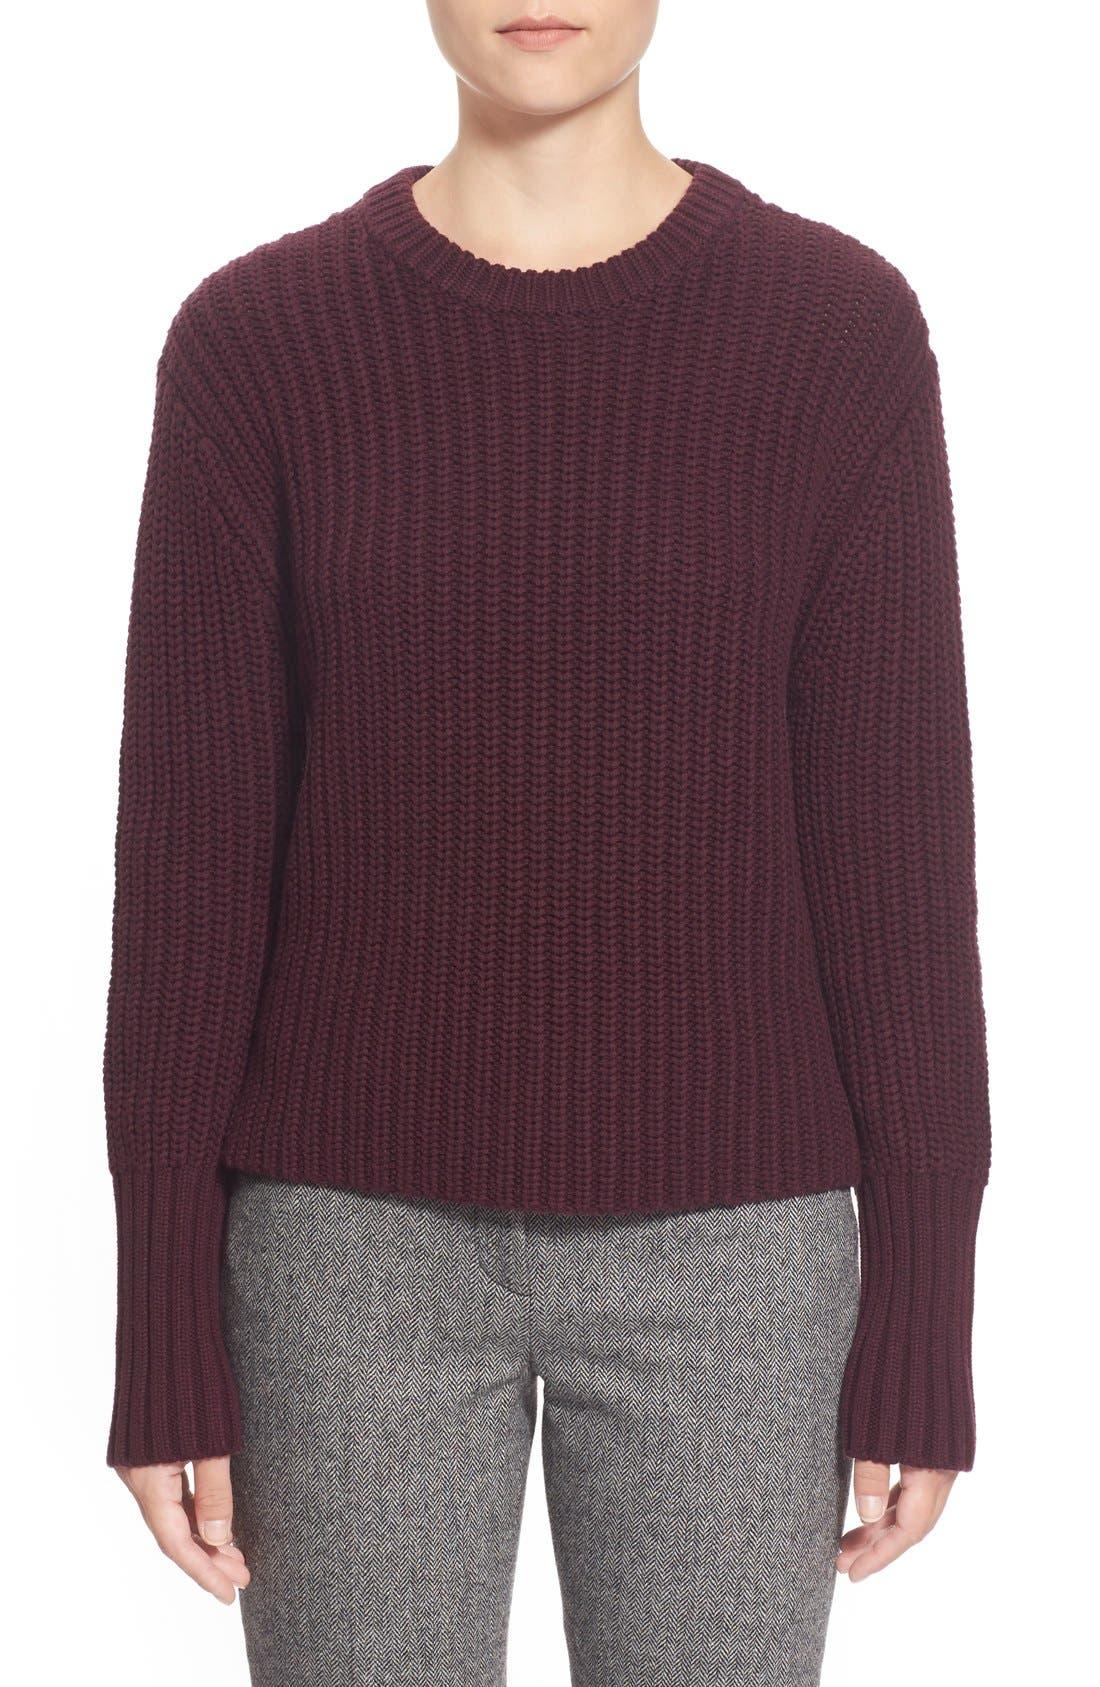 Alternate Image 1 Selected - Pink Tartan Tubular Cuff Wool & CottonSweater